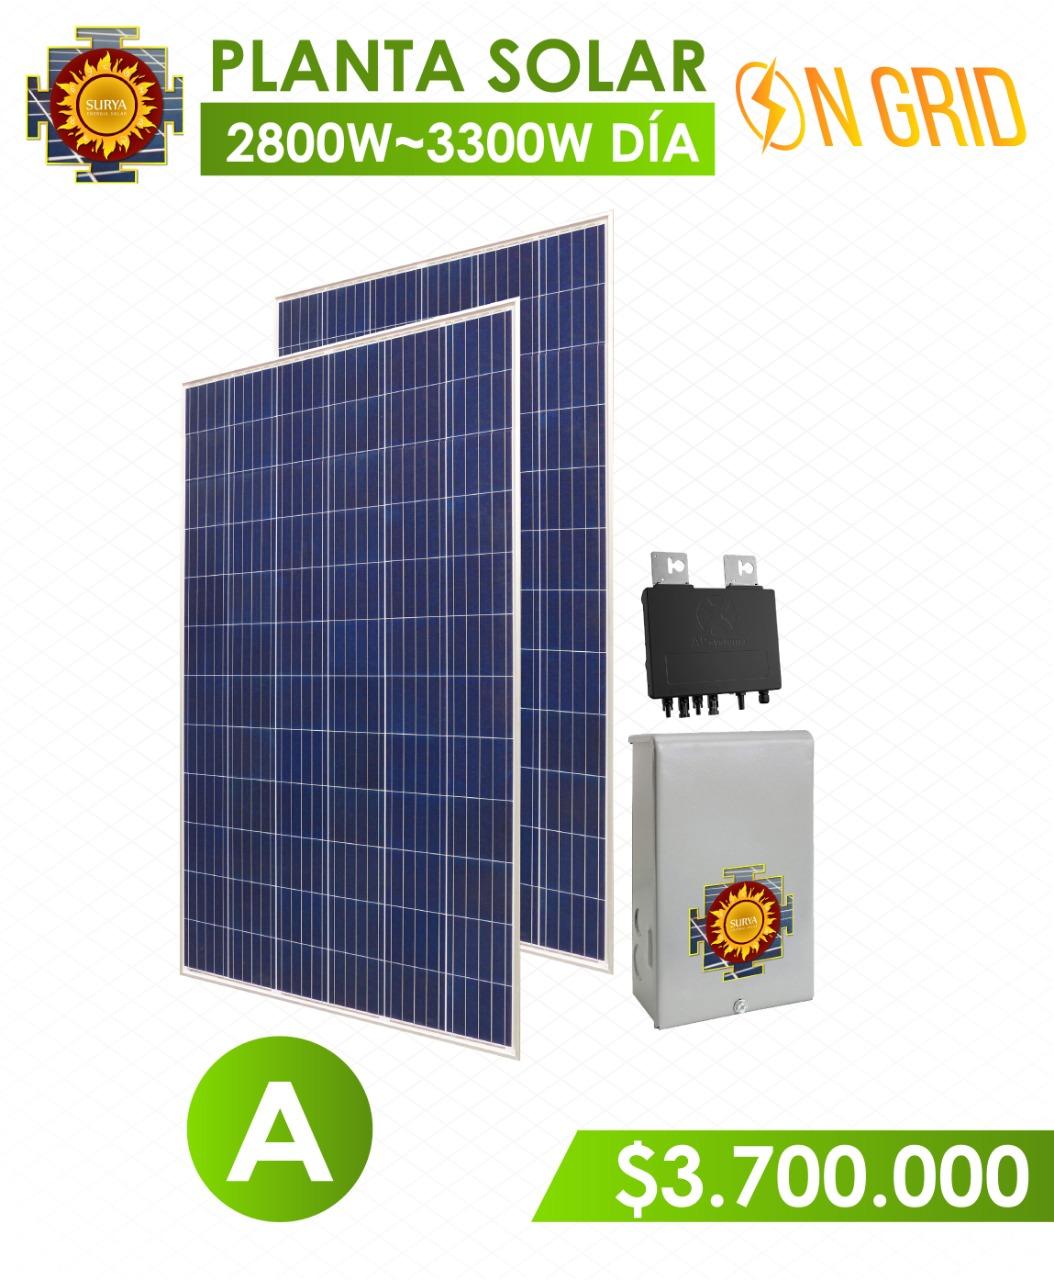 planta solar inyeccion a la red 2800 watts a 3300watts al dia